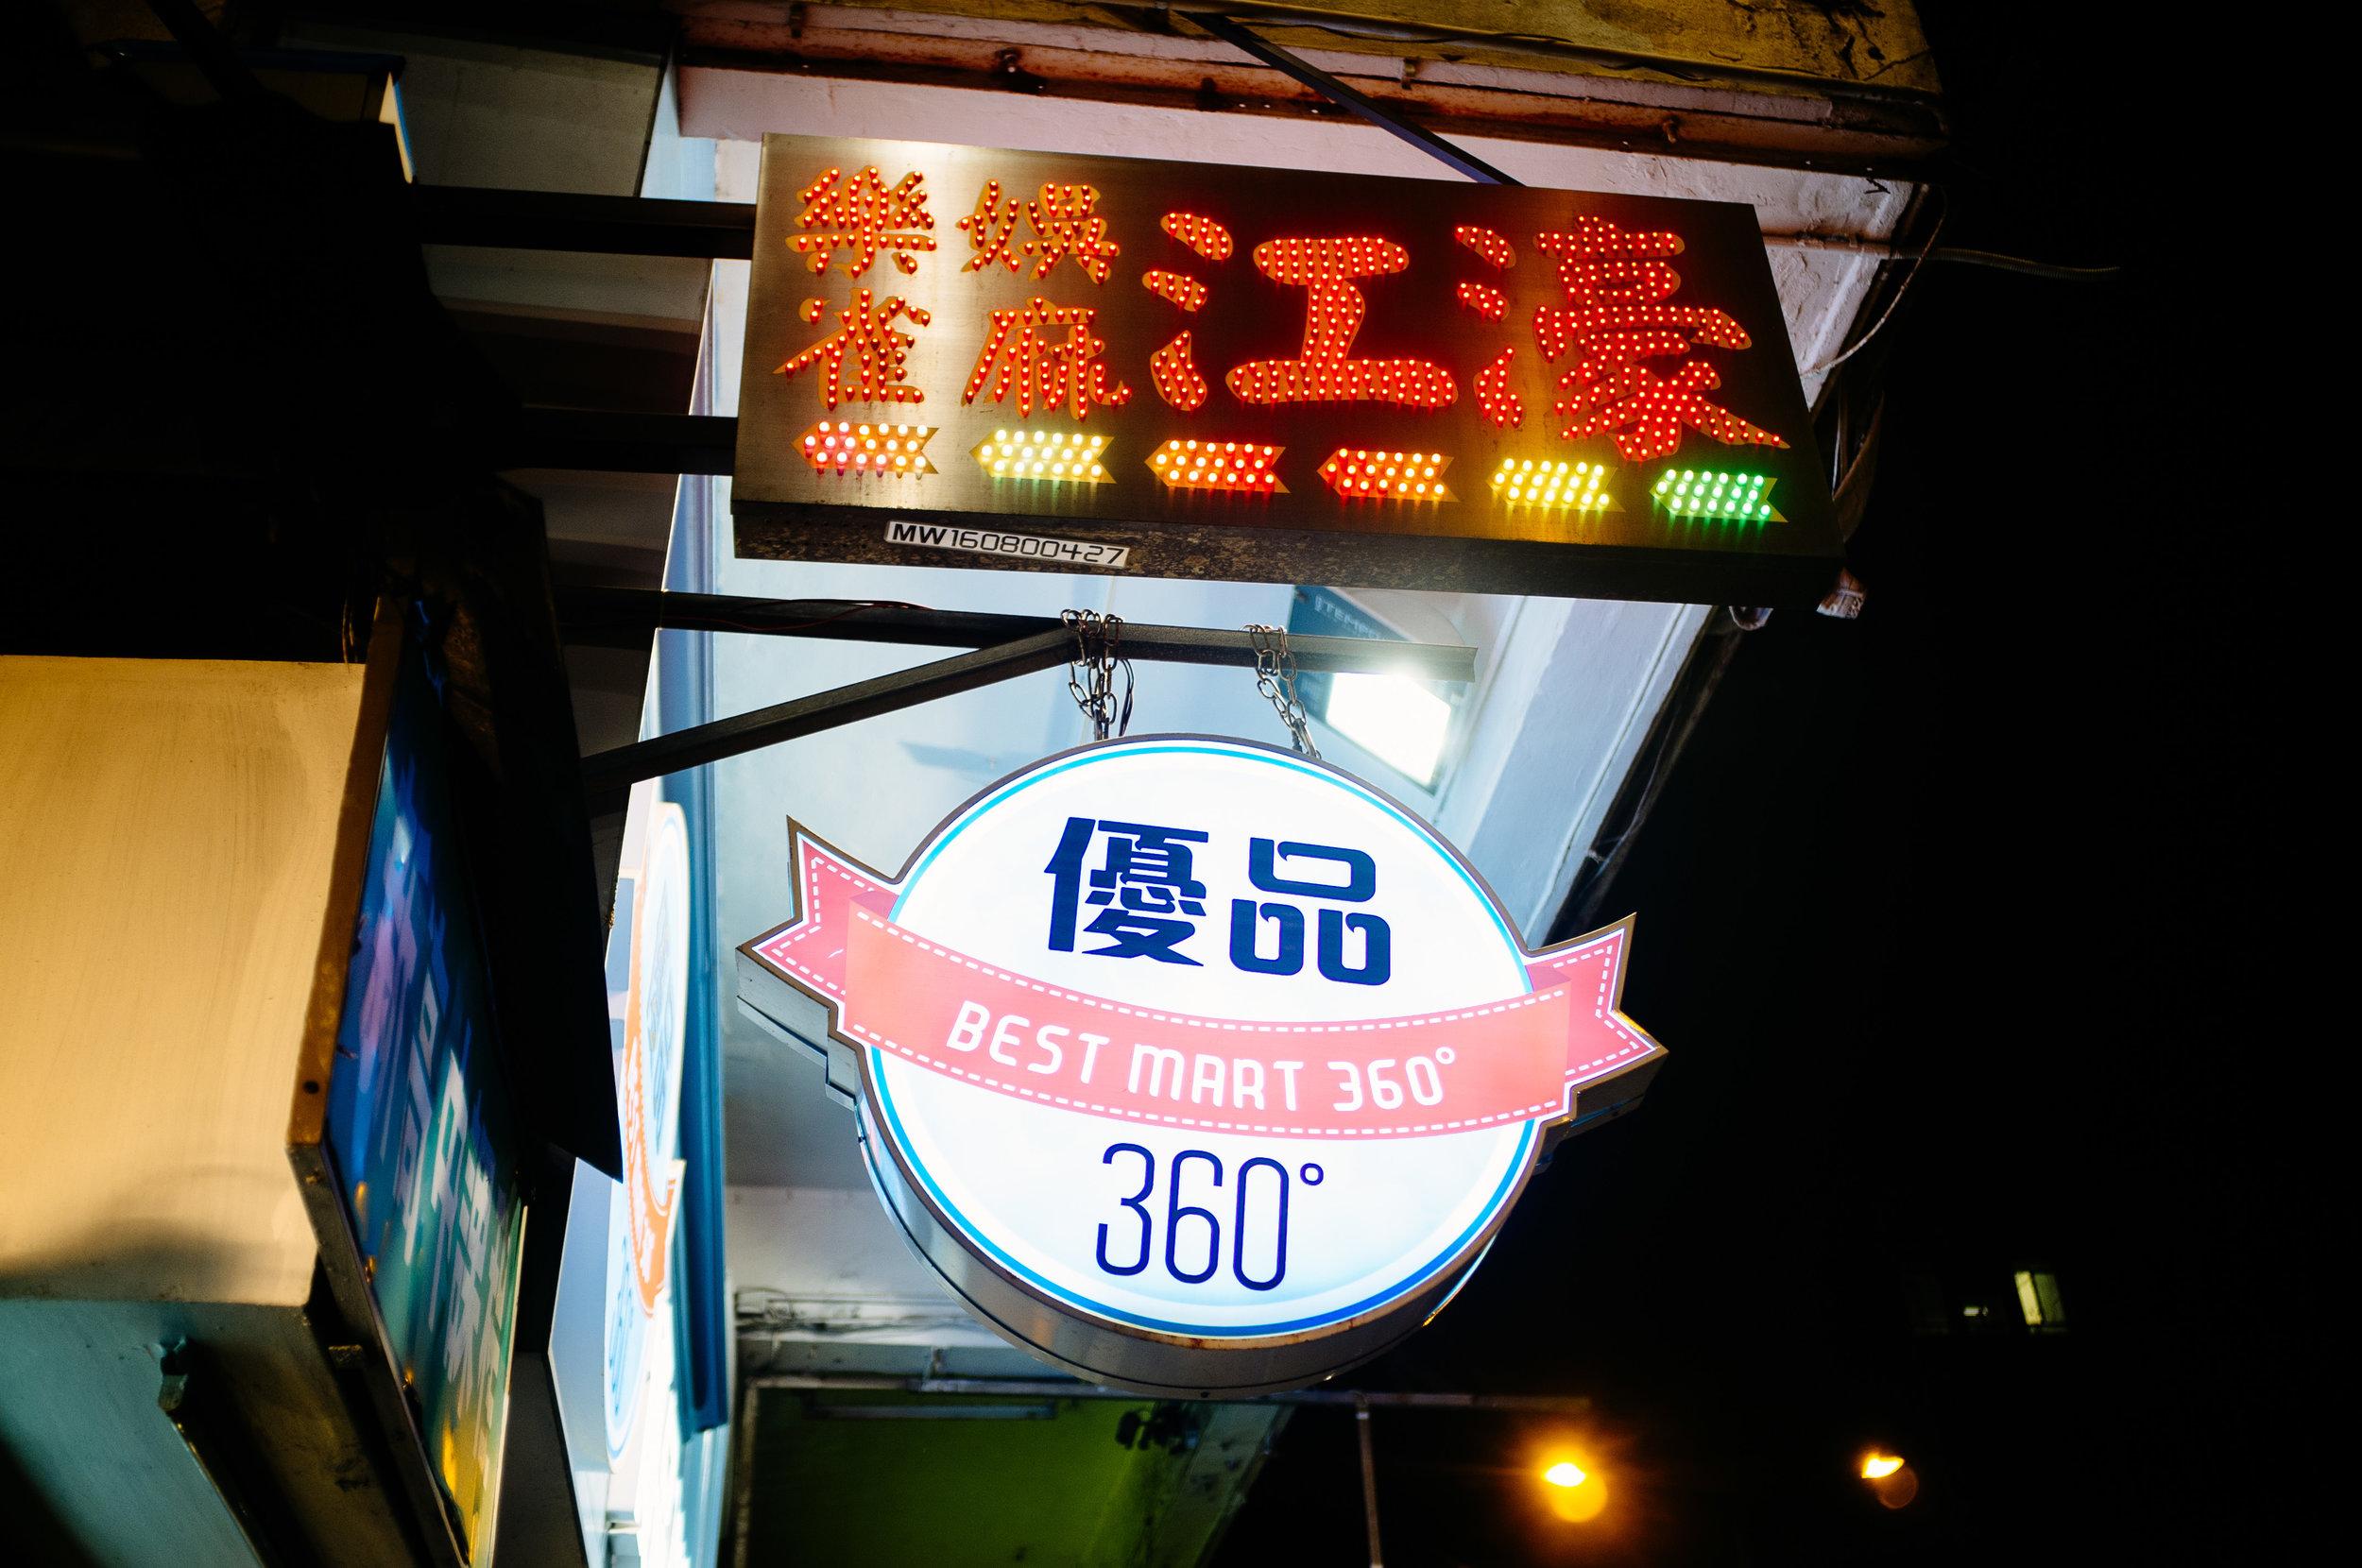 Mong Kok Best Mart.jpg